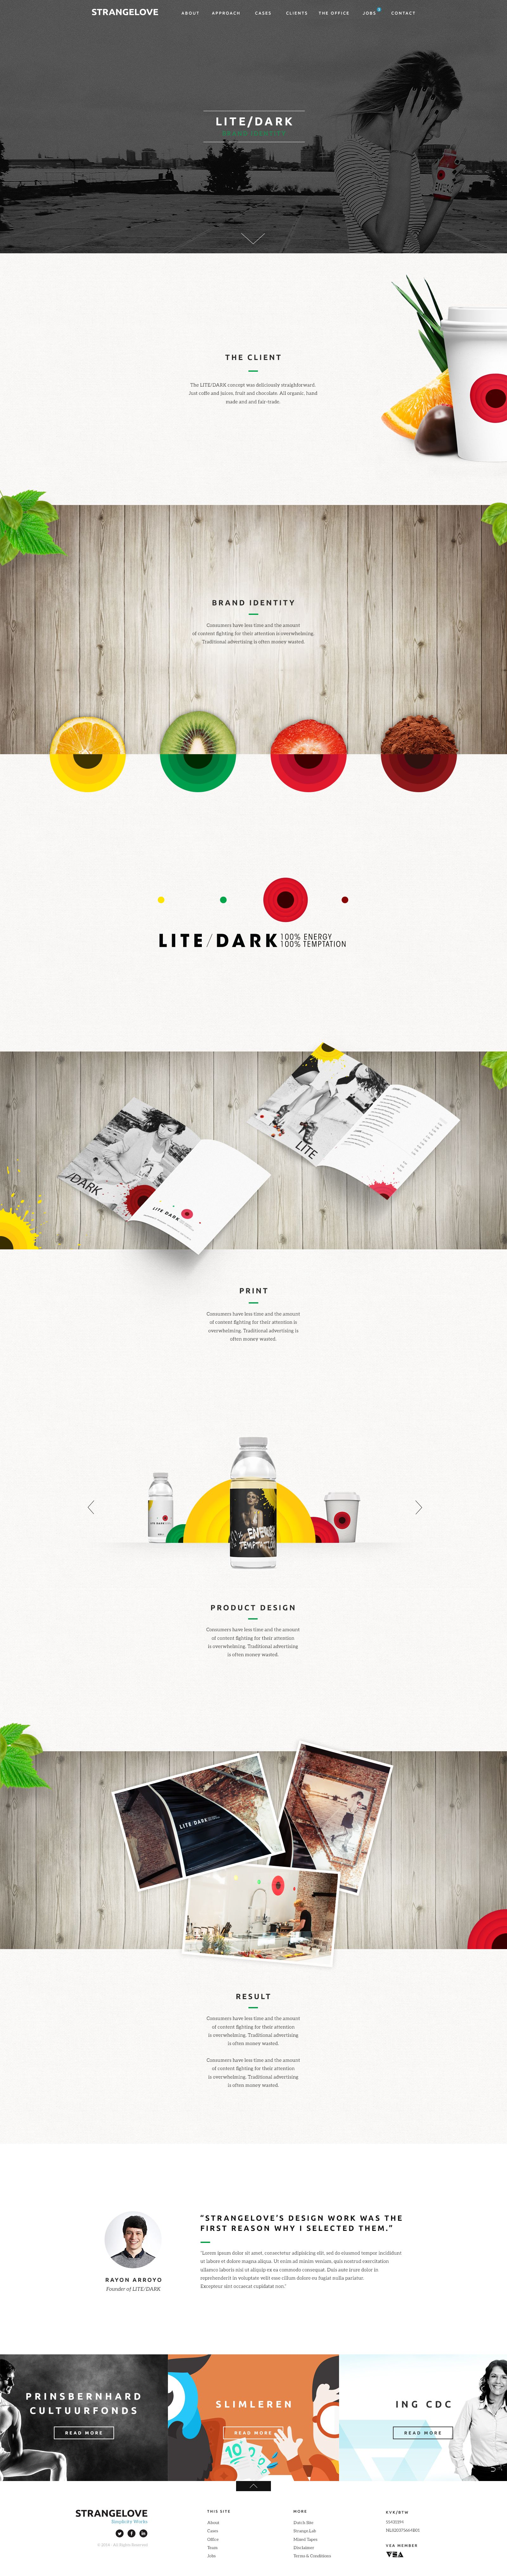 Unique Web Design Strange Love Hohous Webdesign Design Http